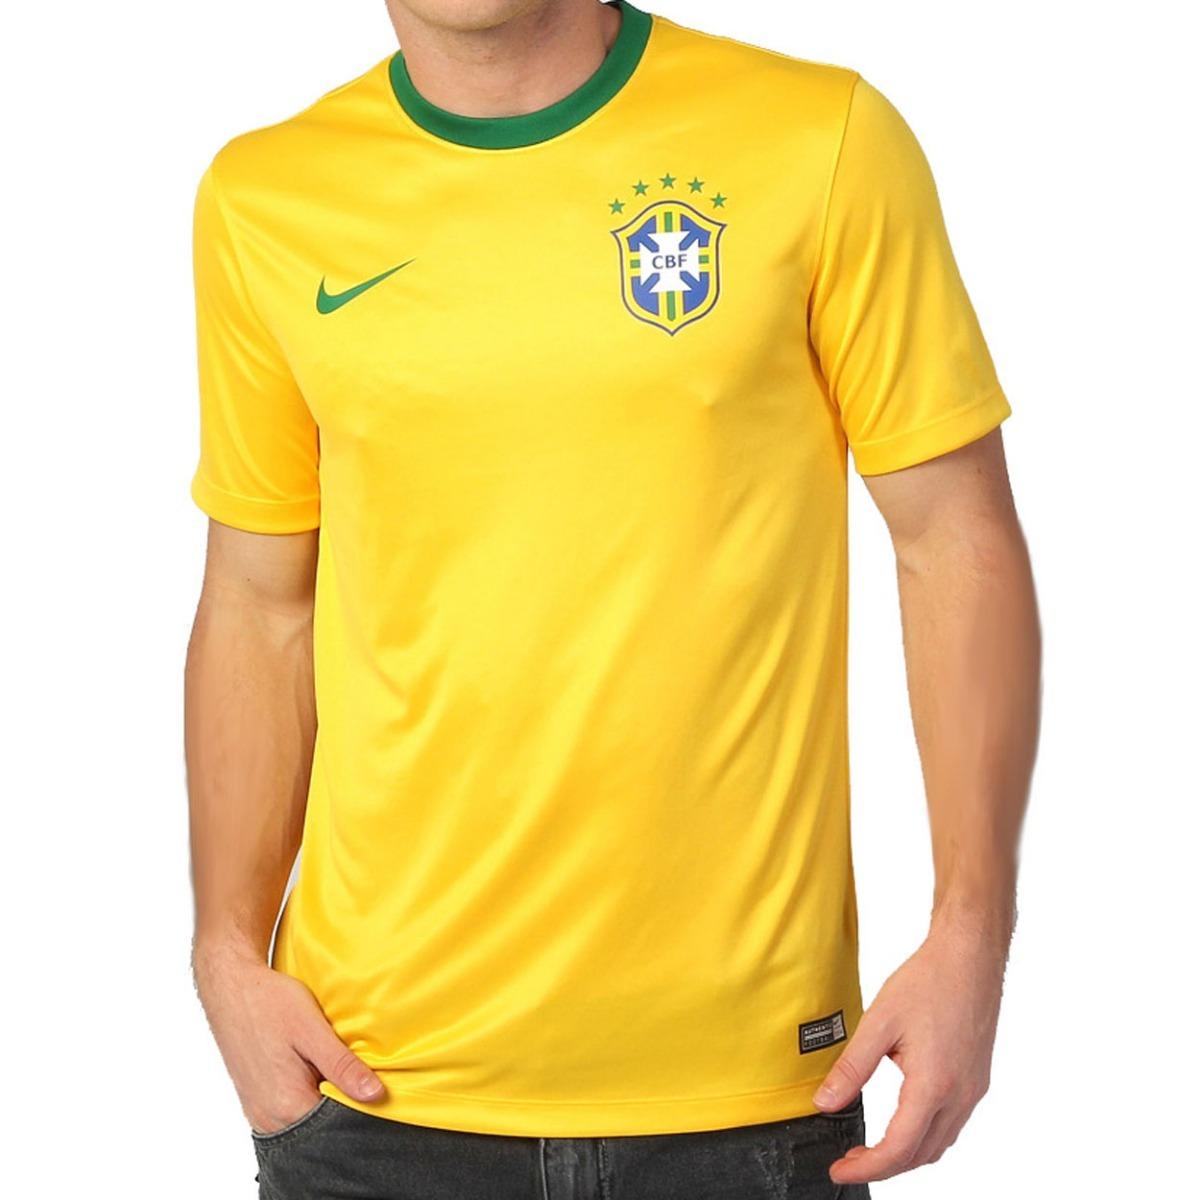 95cf490fd5 Camiseta Brasil Oficial Torcedor Nike 2014